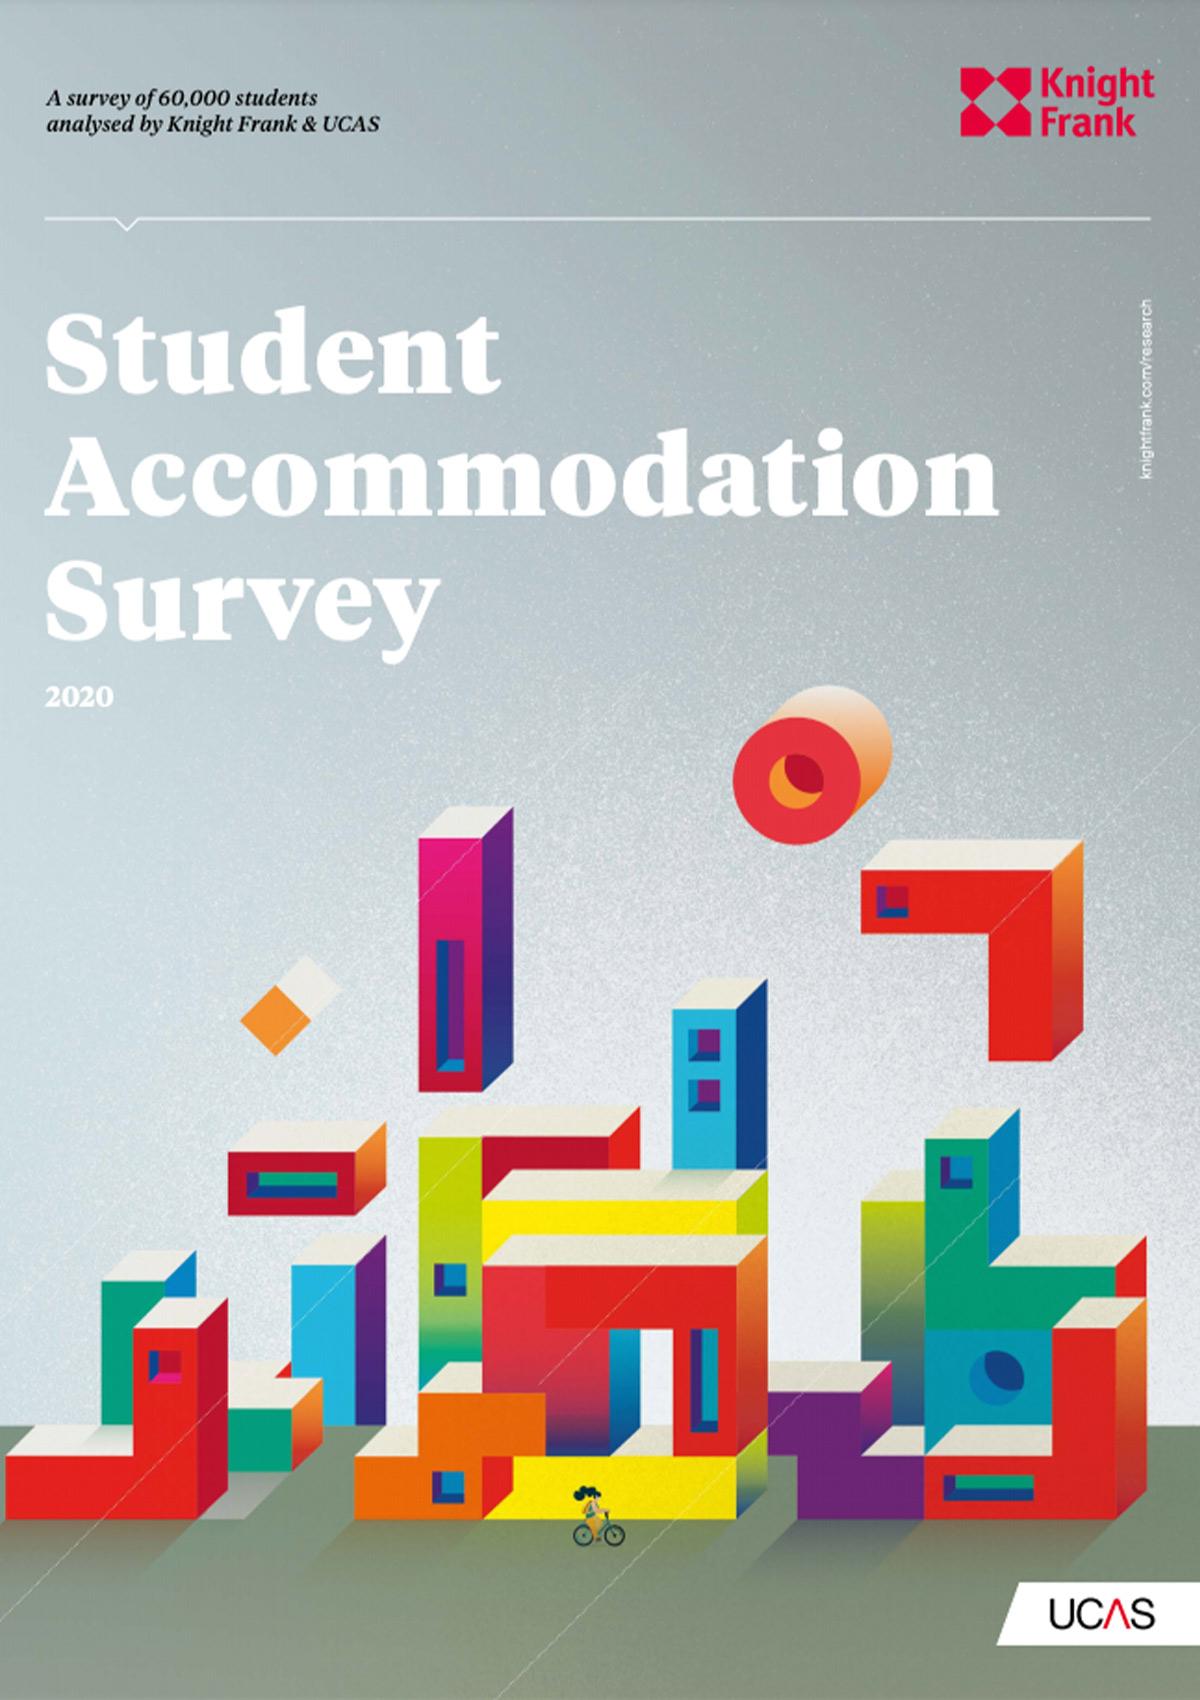 Student Accommodation Survey Report